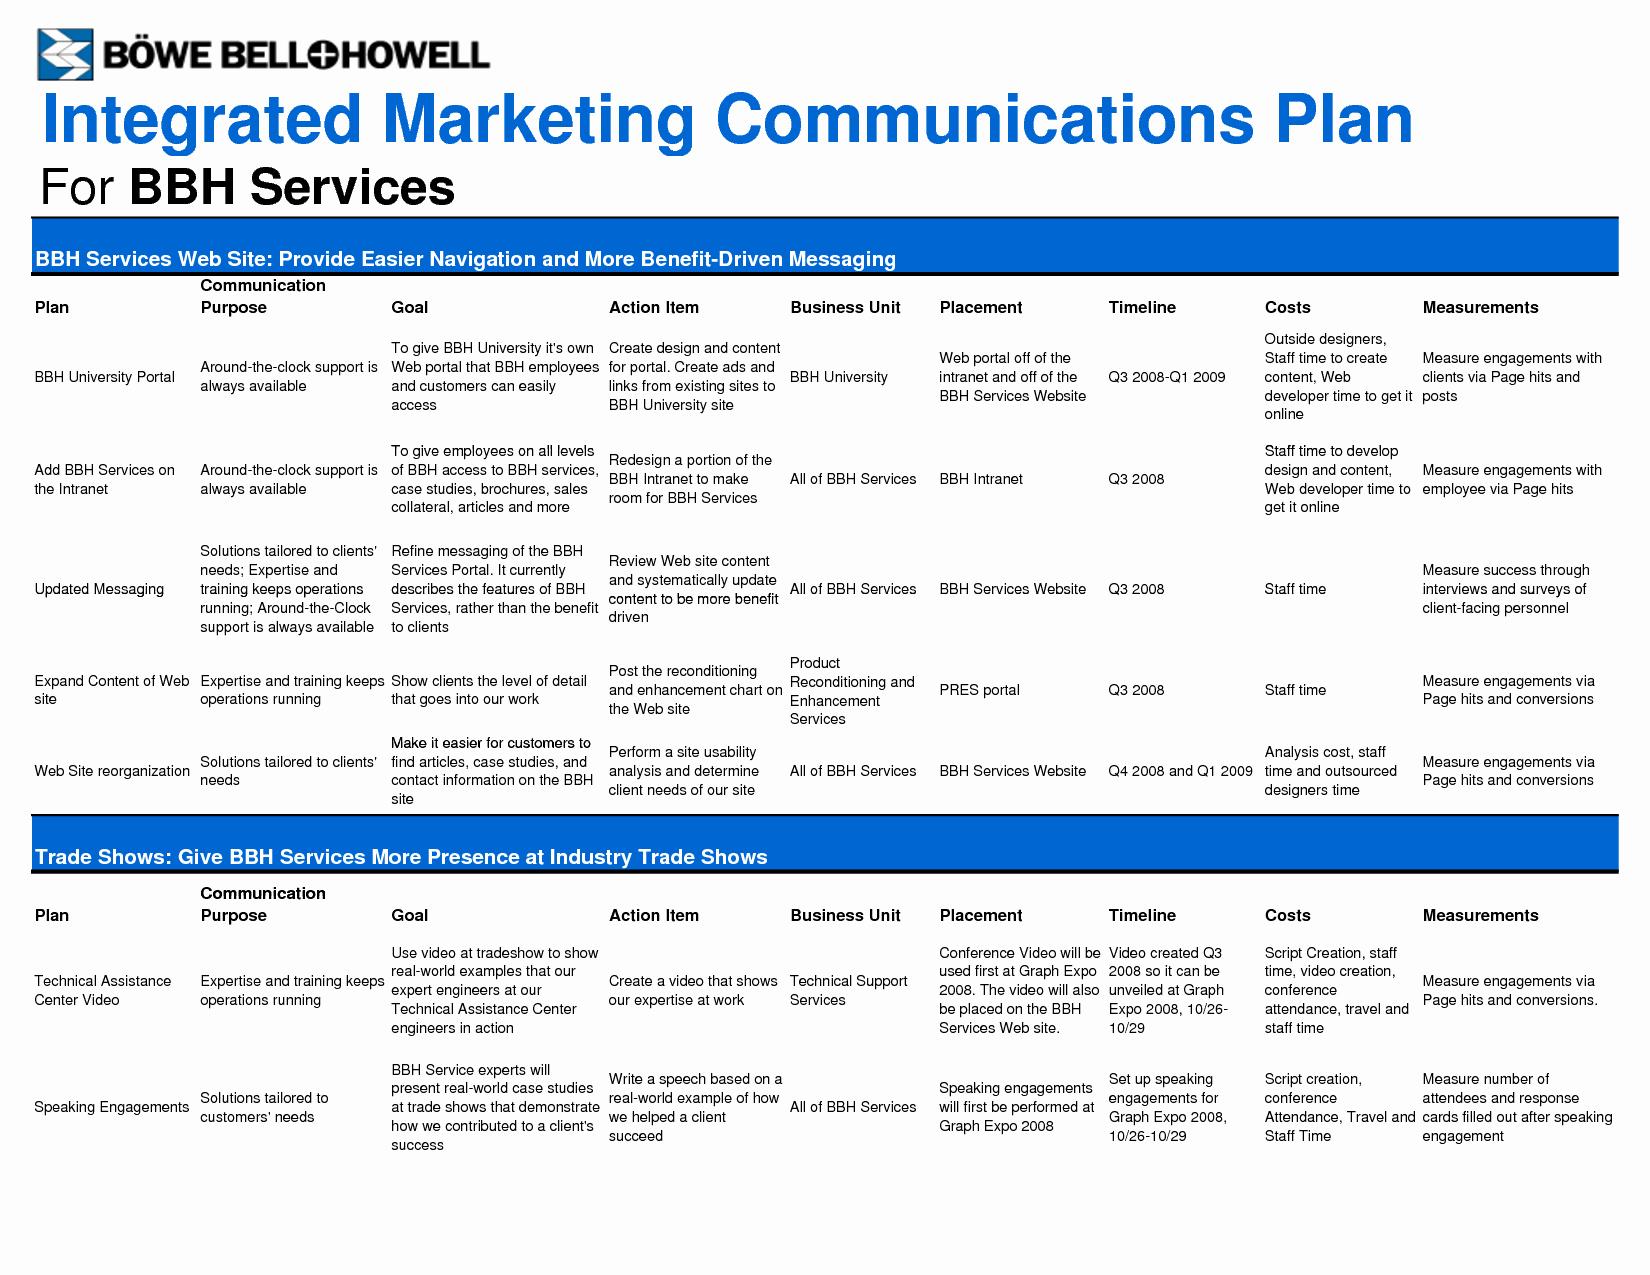 Marketing Communications Plan Template Elegant Marketing Plan Template Google Search